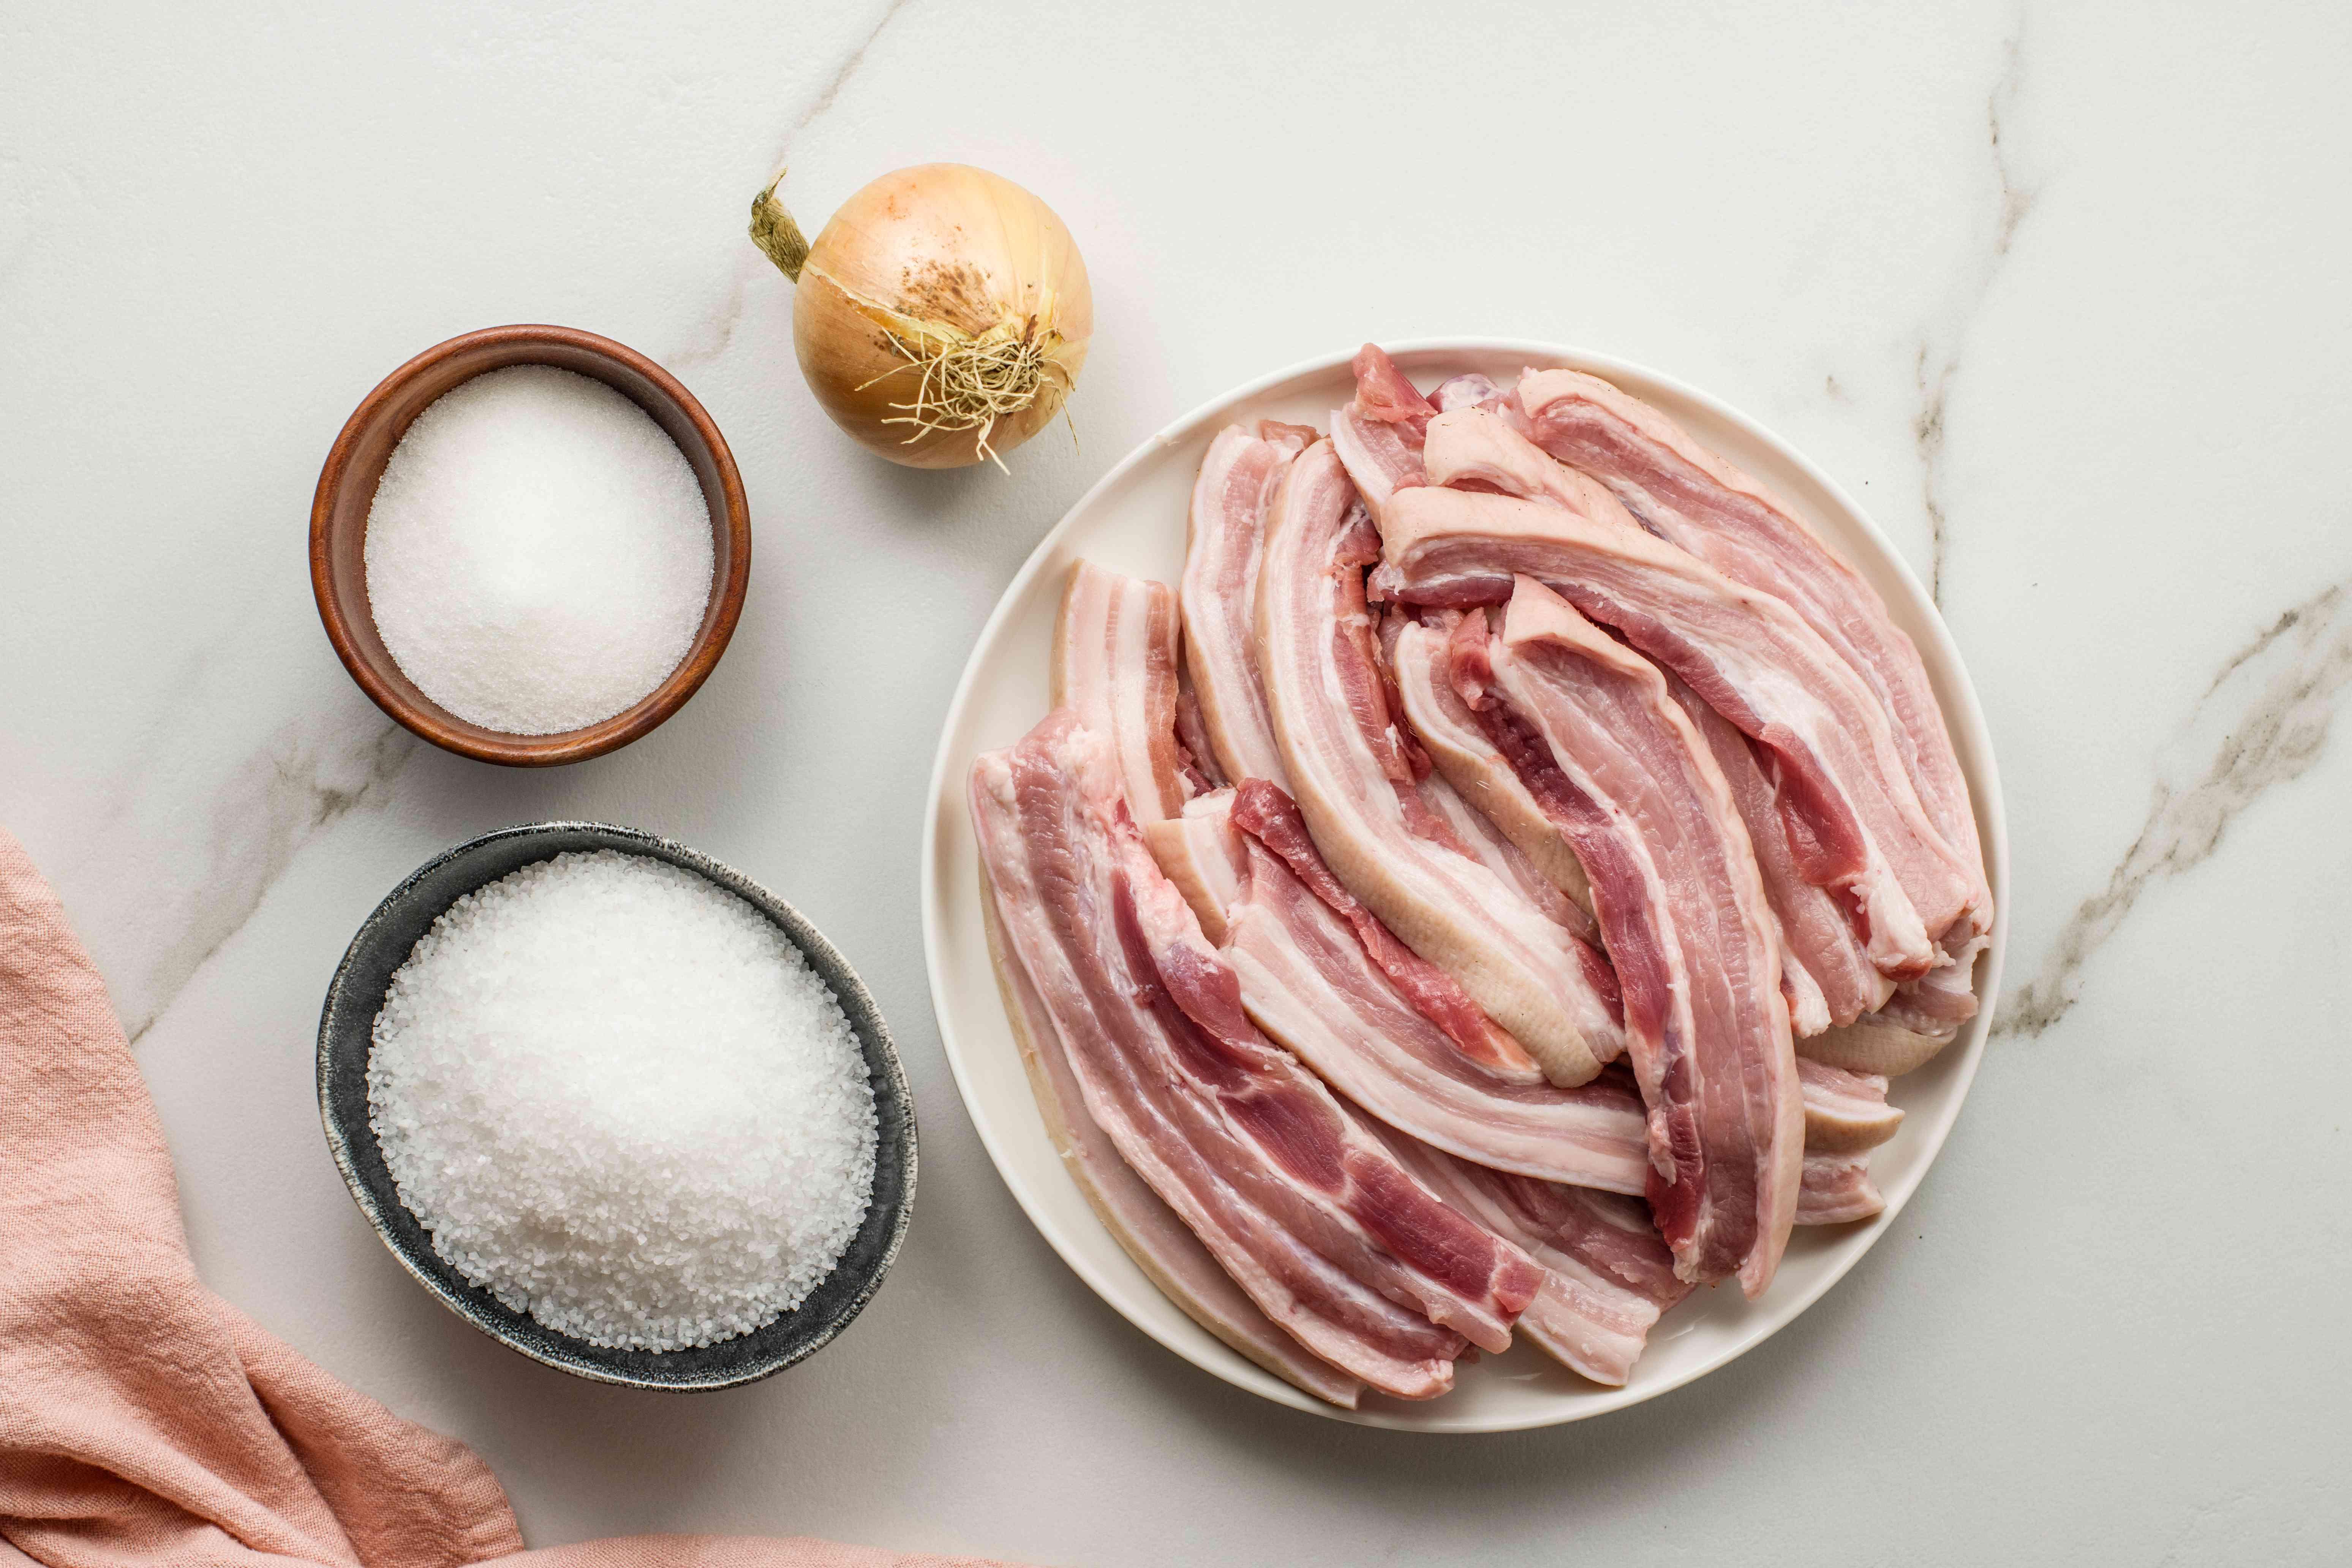 Salt pork ingredients